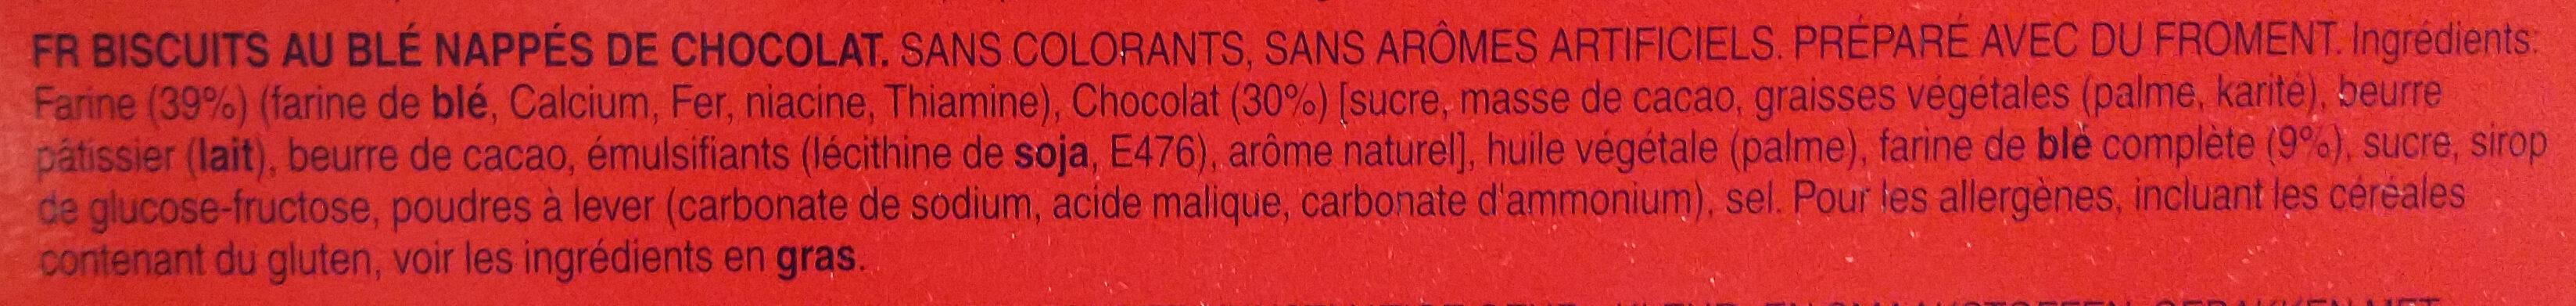 Digestive - Dark Chocolate - Ingredients - fr